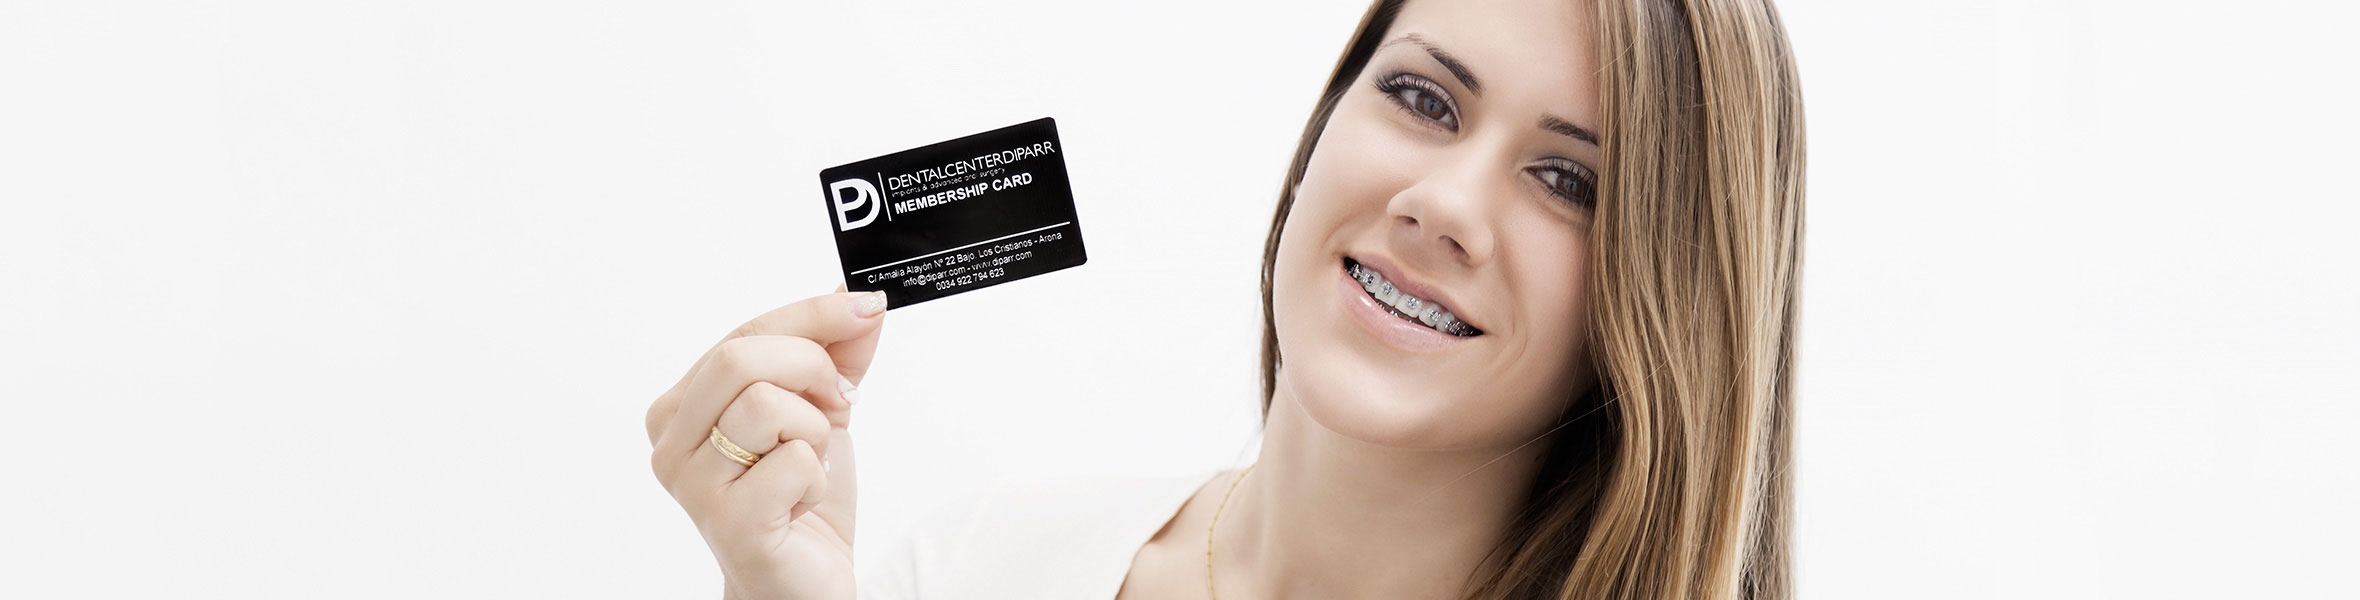 tarjeta de fidelización en dental center diparr